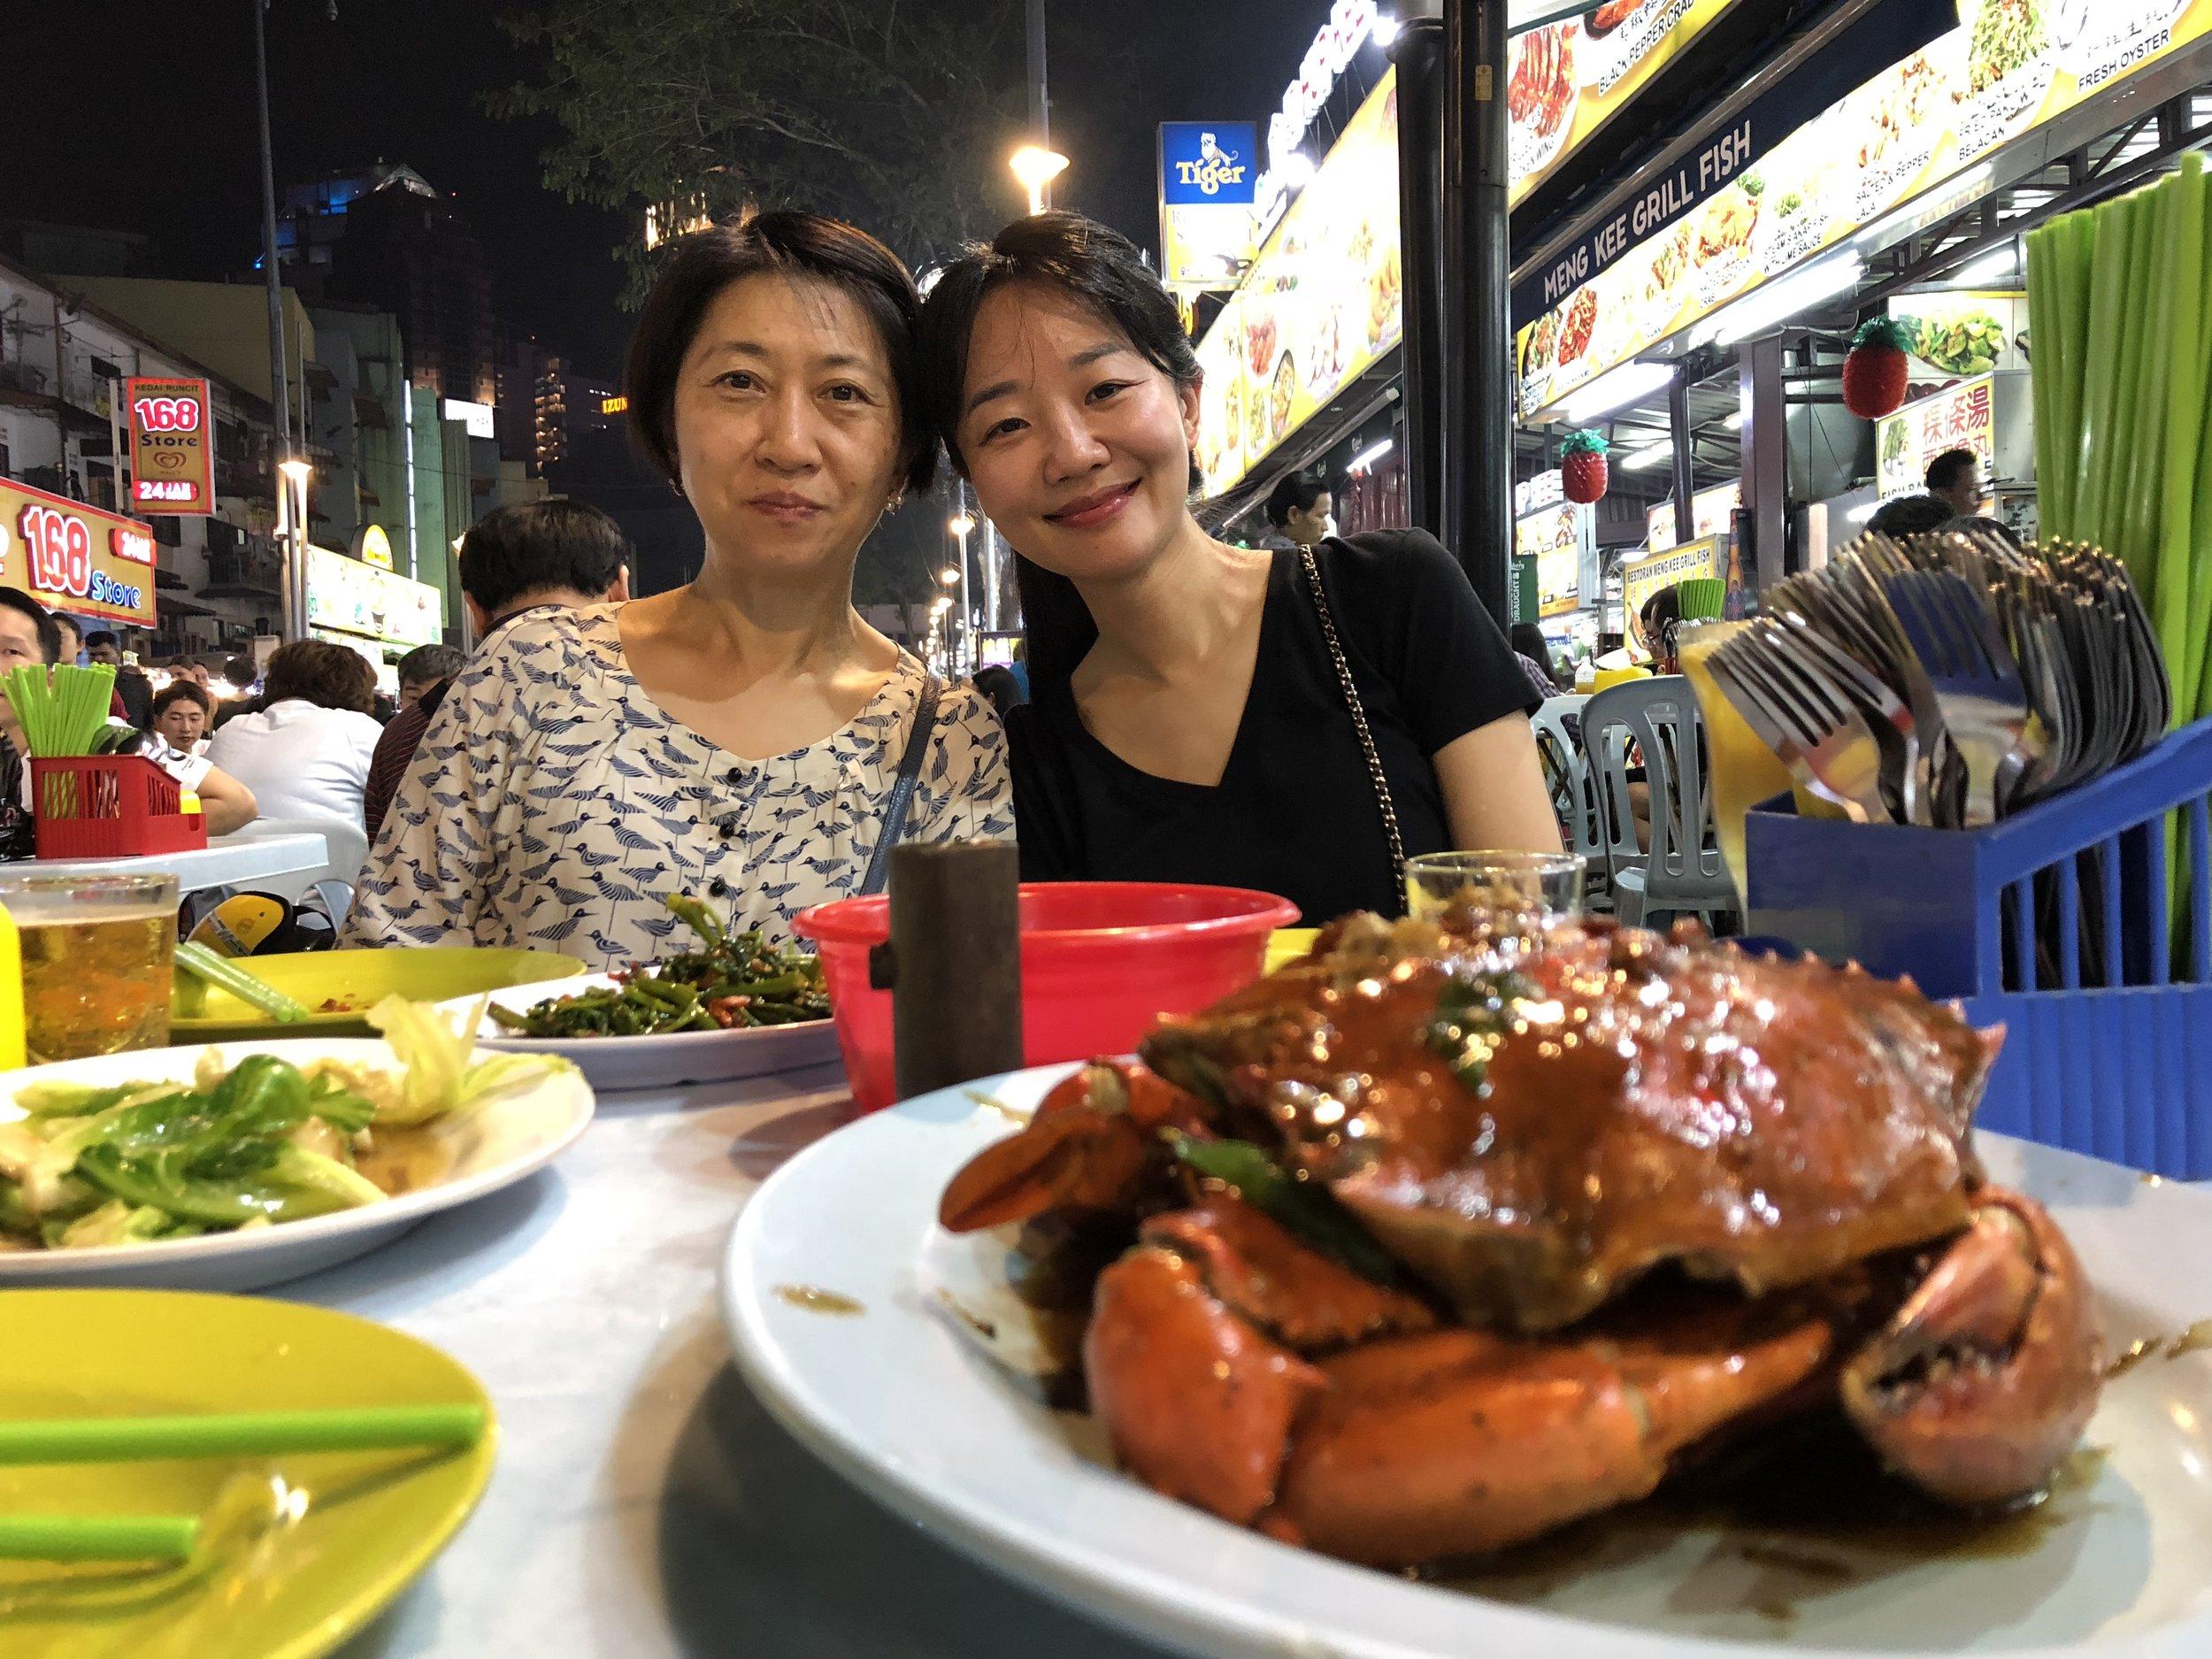 Enjoying a seafood meal at the Jalan Alor food street in Bukit Bintang KL with SAS Board members Sue and Christina